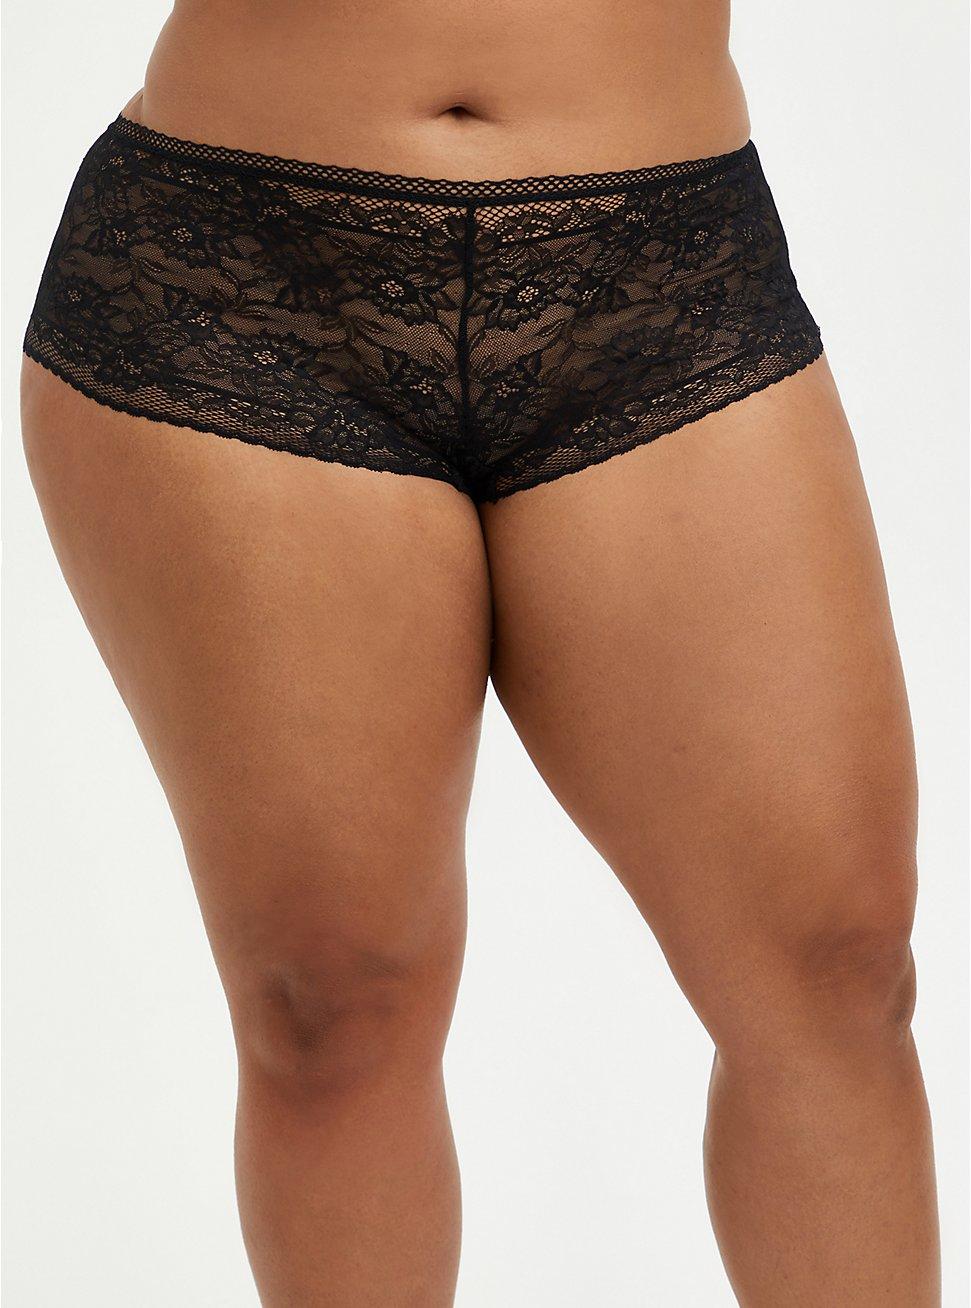 Cheeky Panty - Lace Black, RICH BLACK, hi-res